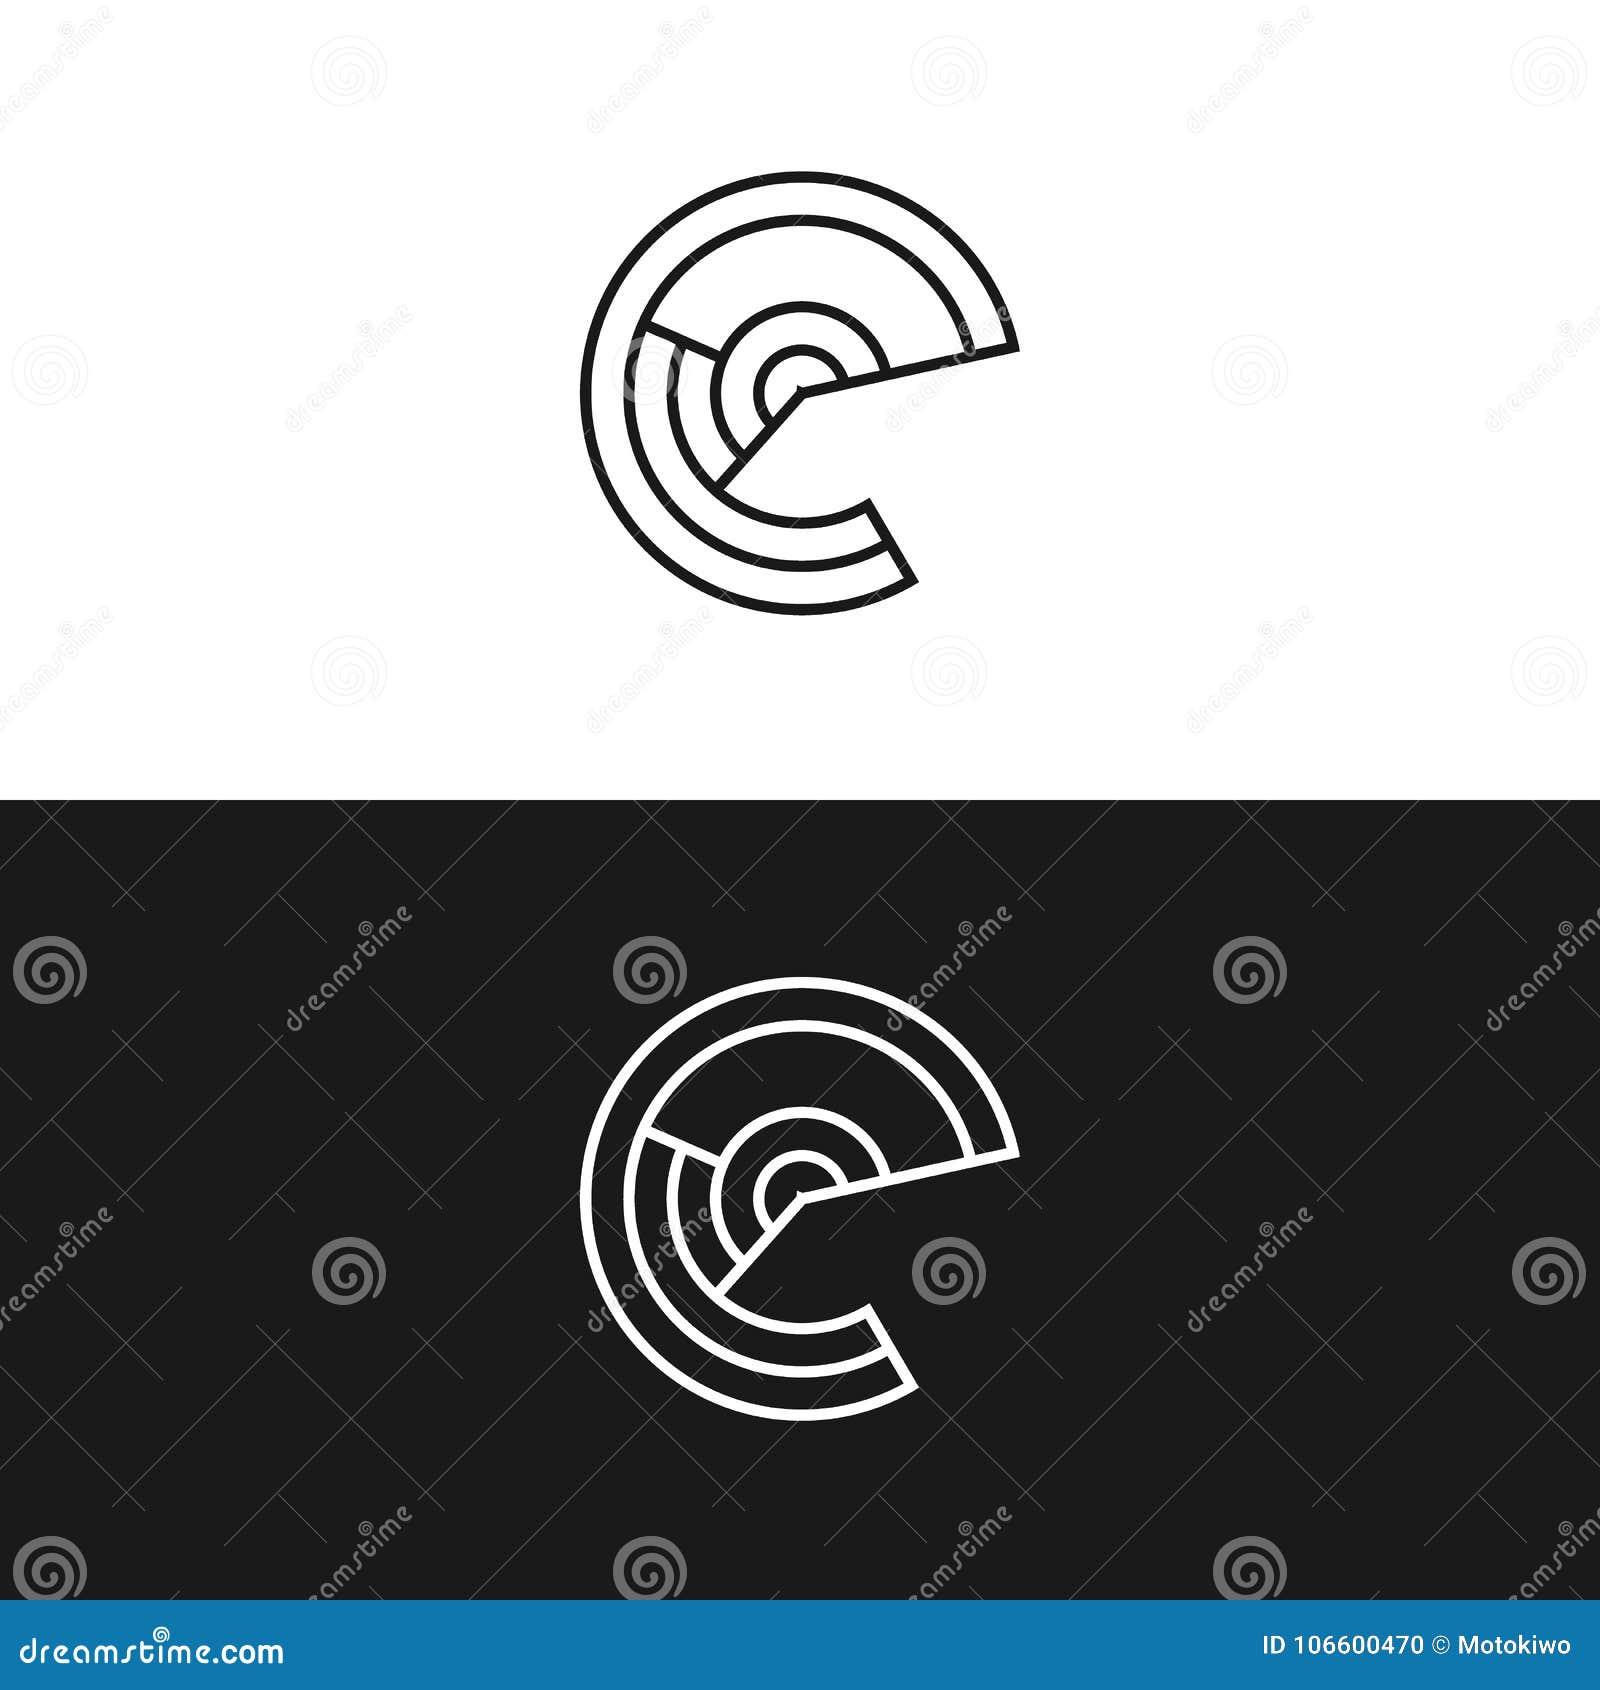 Abstract Letter E Logo Design Idea Stock Vector Illustration Of